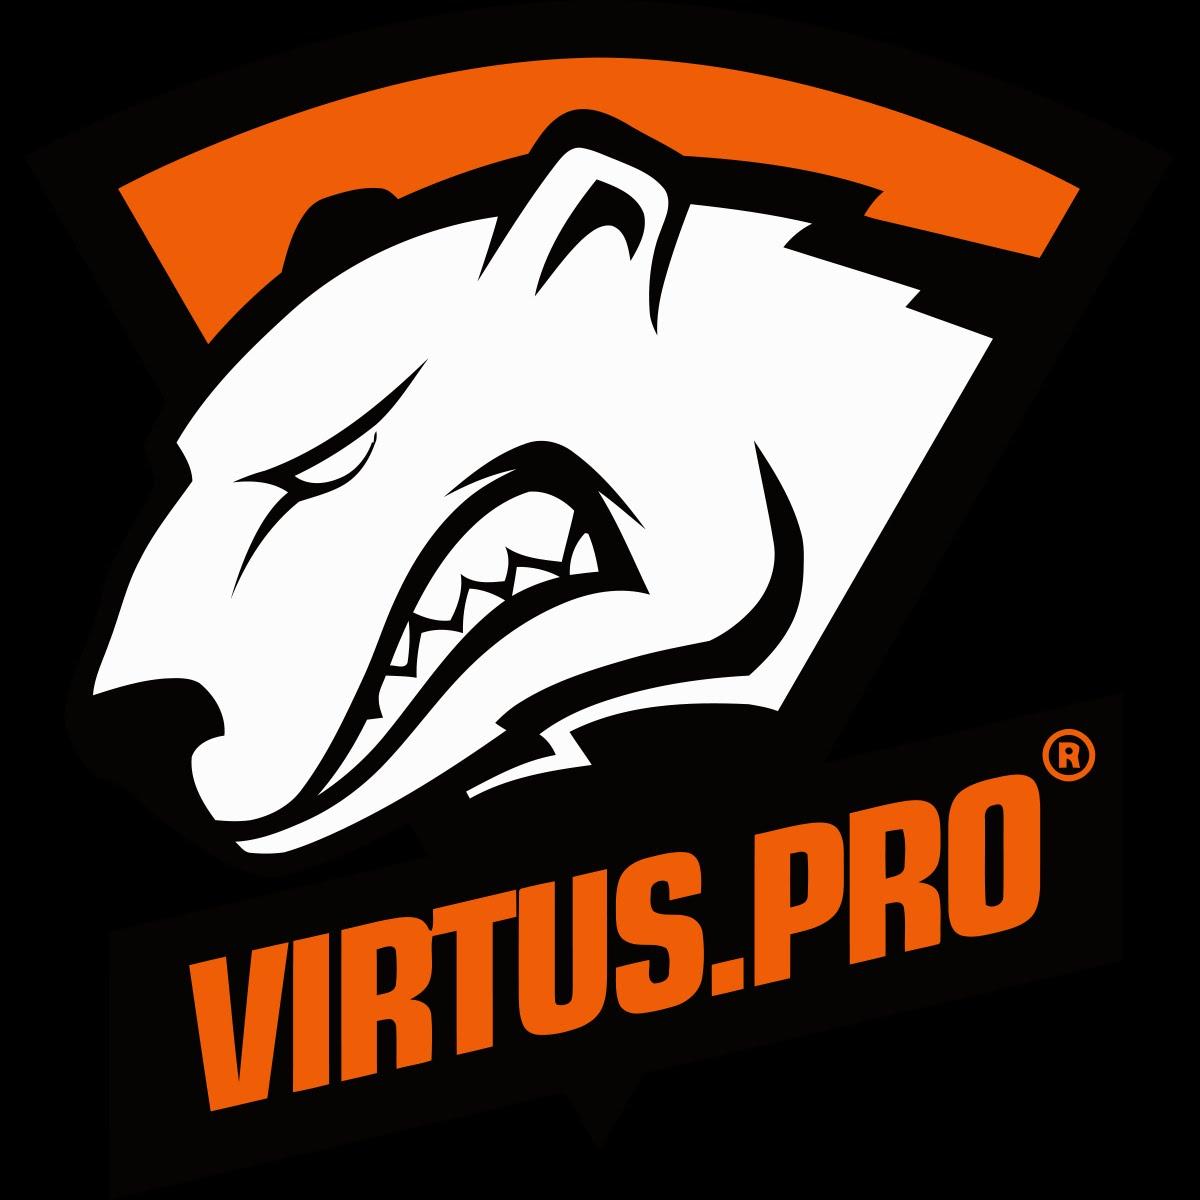 virtus-pro